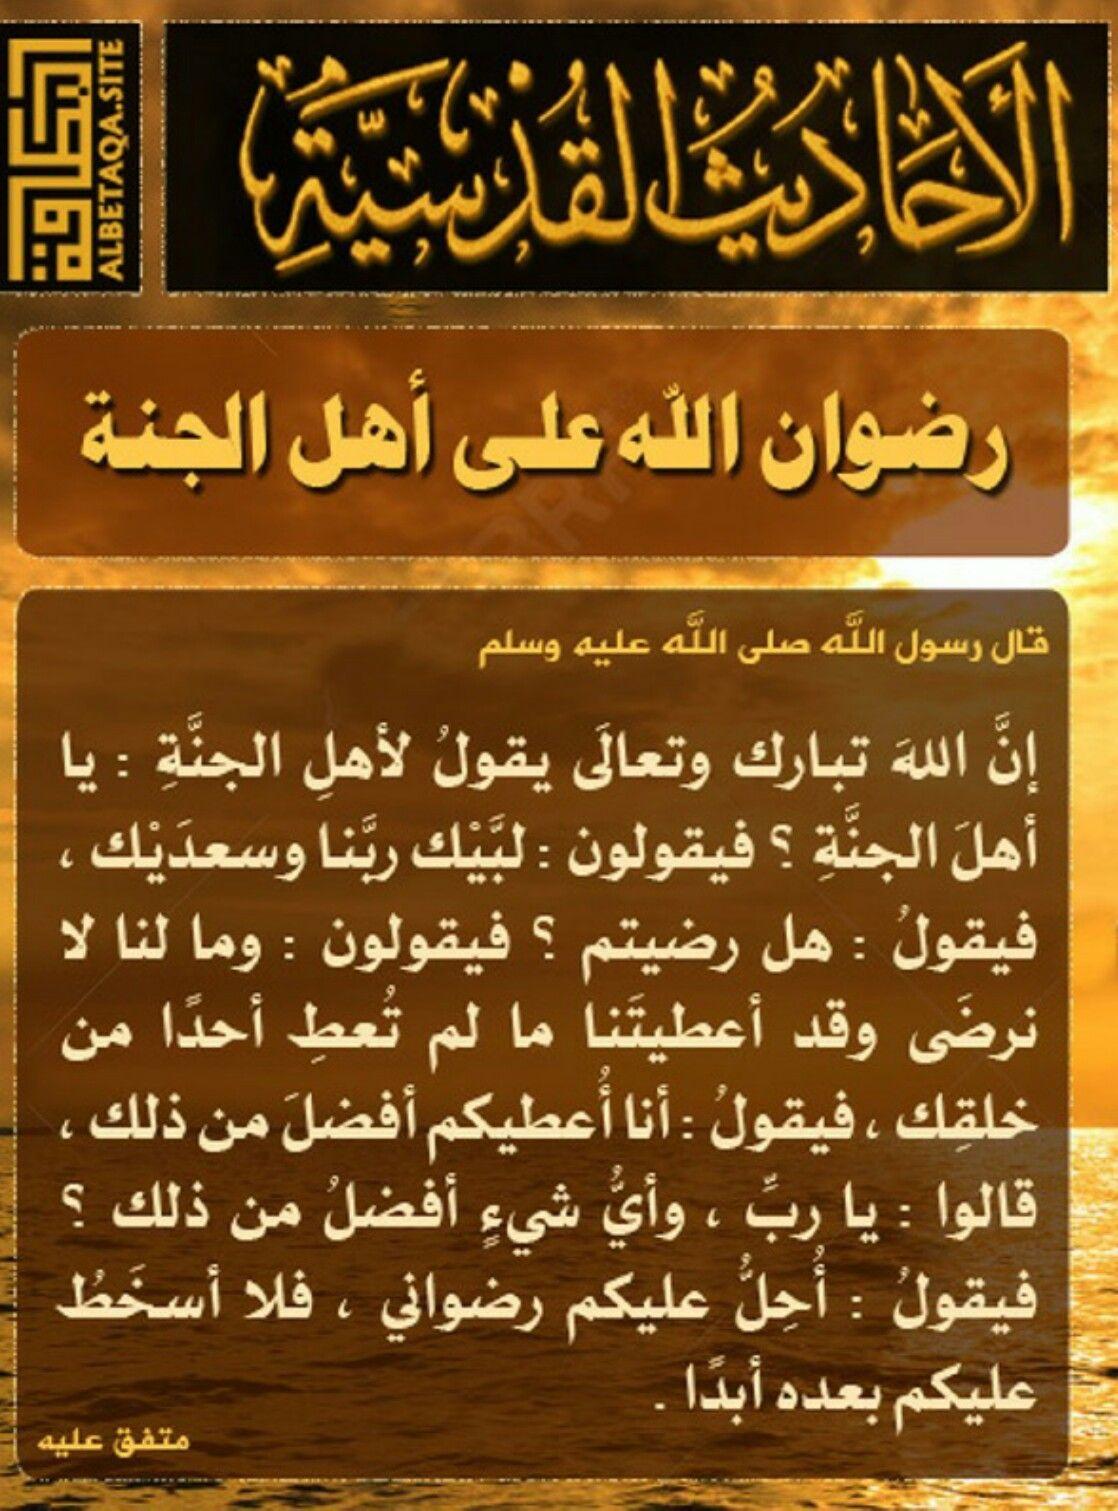 Pin By Raflam21 On سلسله الاحاديث القدسيه Islam Facts Islamic Quotes Wallpaper Muslim Greeting